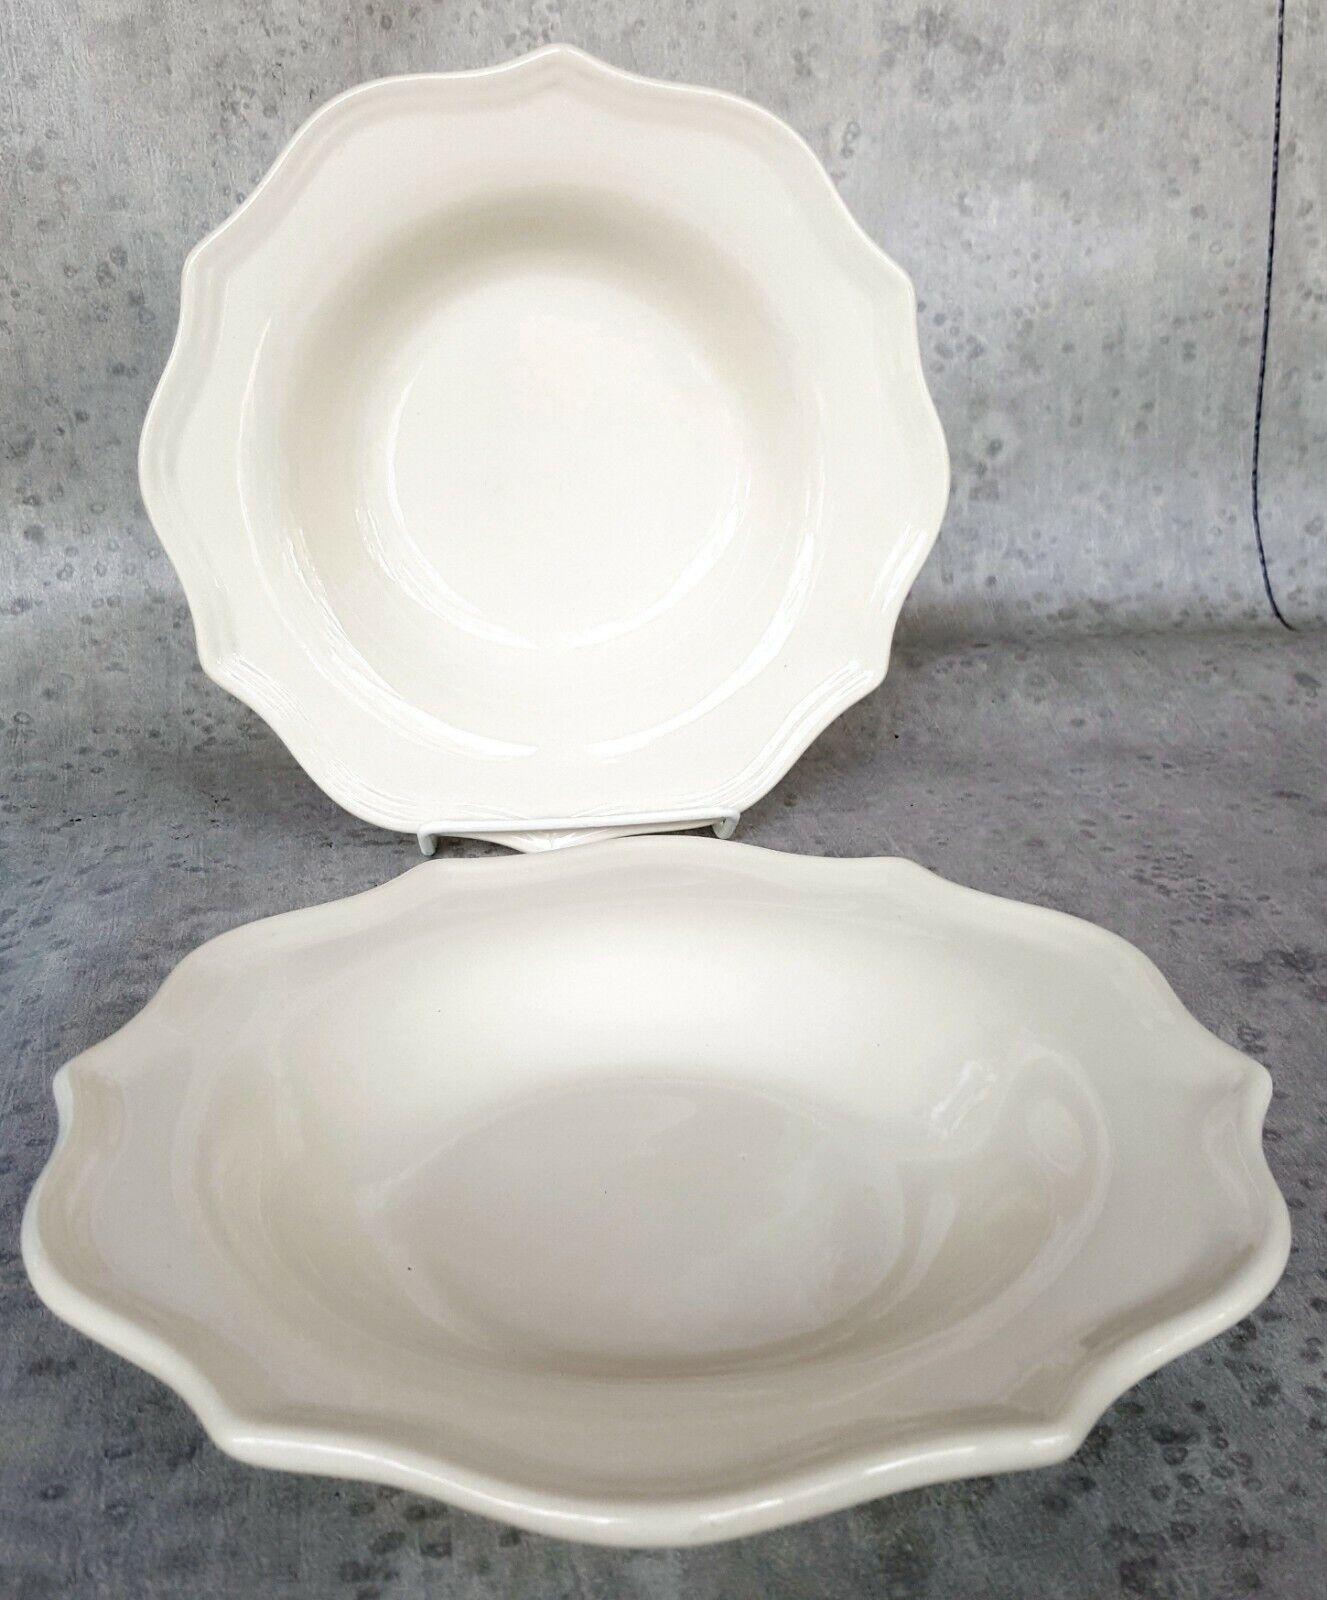 6 Williams Sonoma Manosque soup bowls baroque baroque baroque Portugal 75d8cf